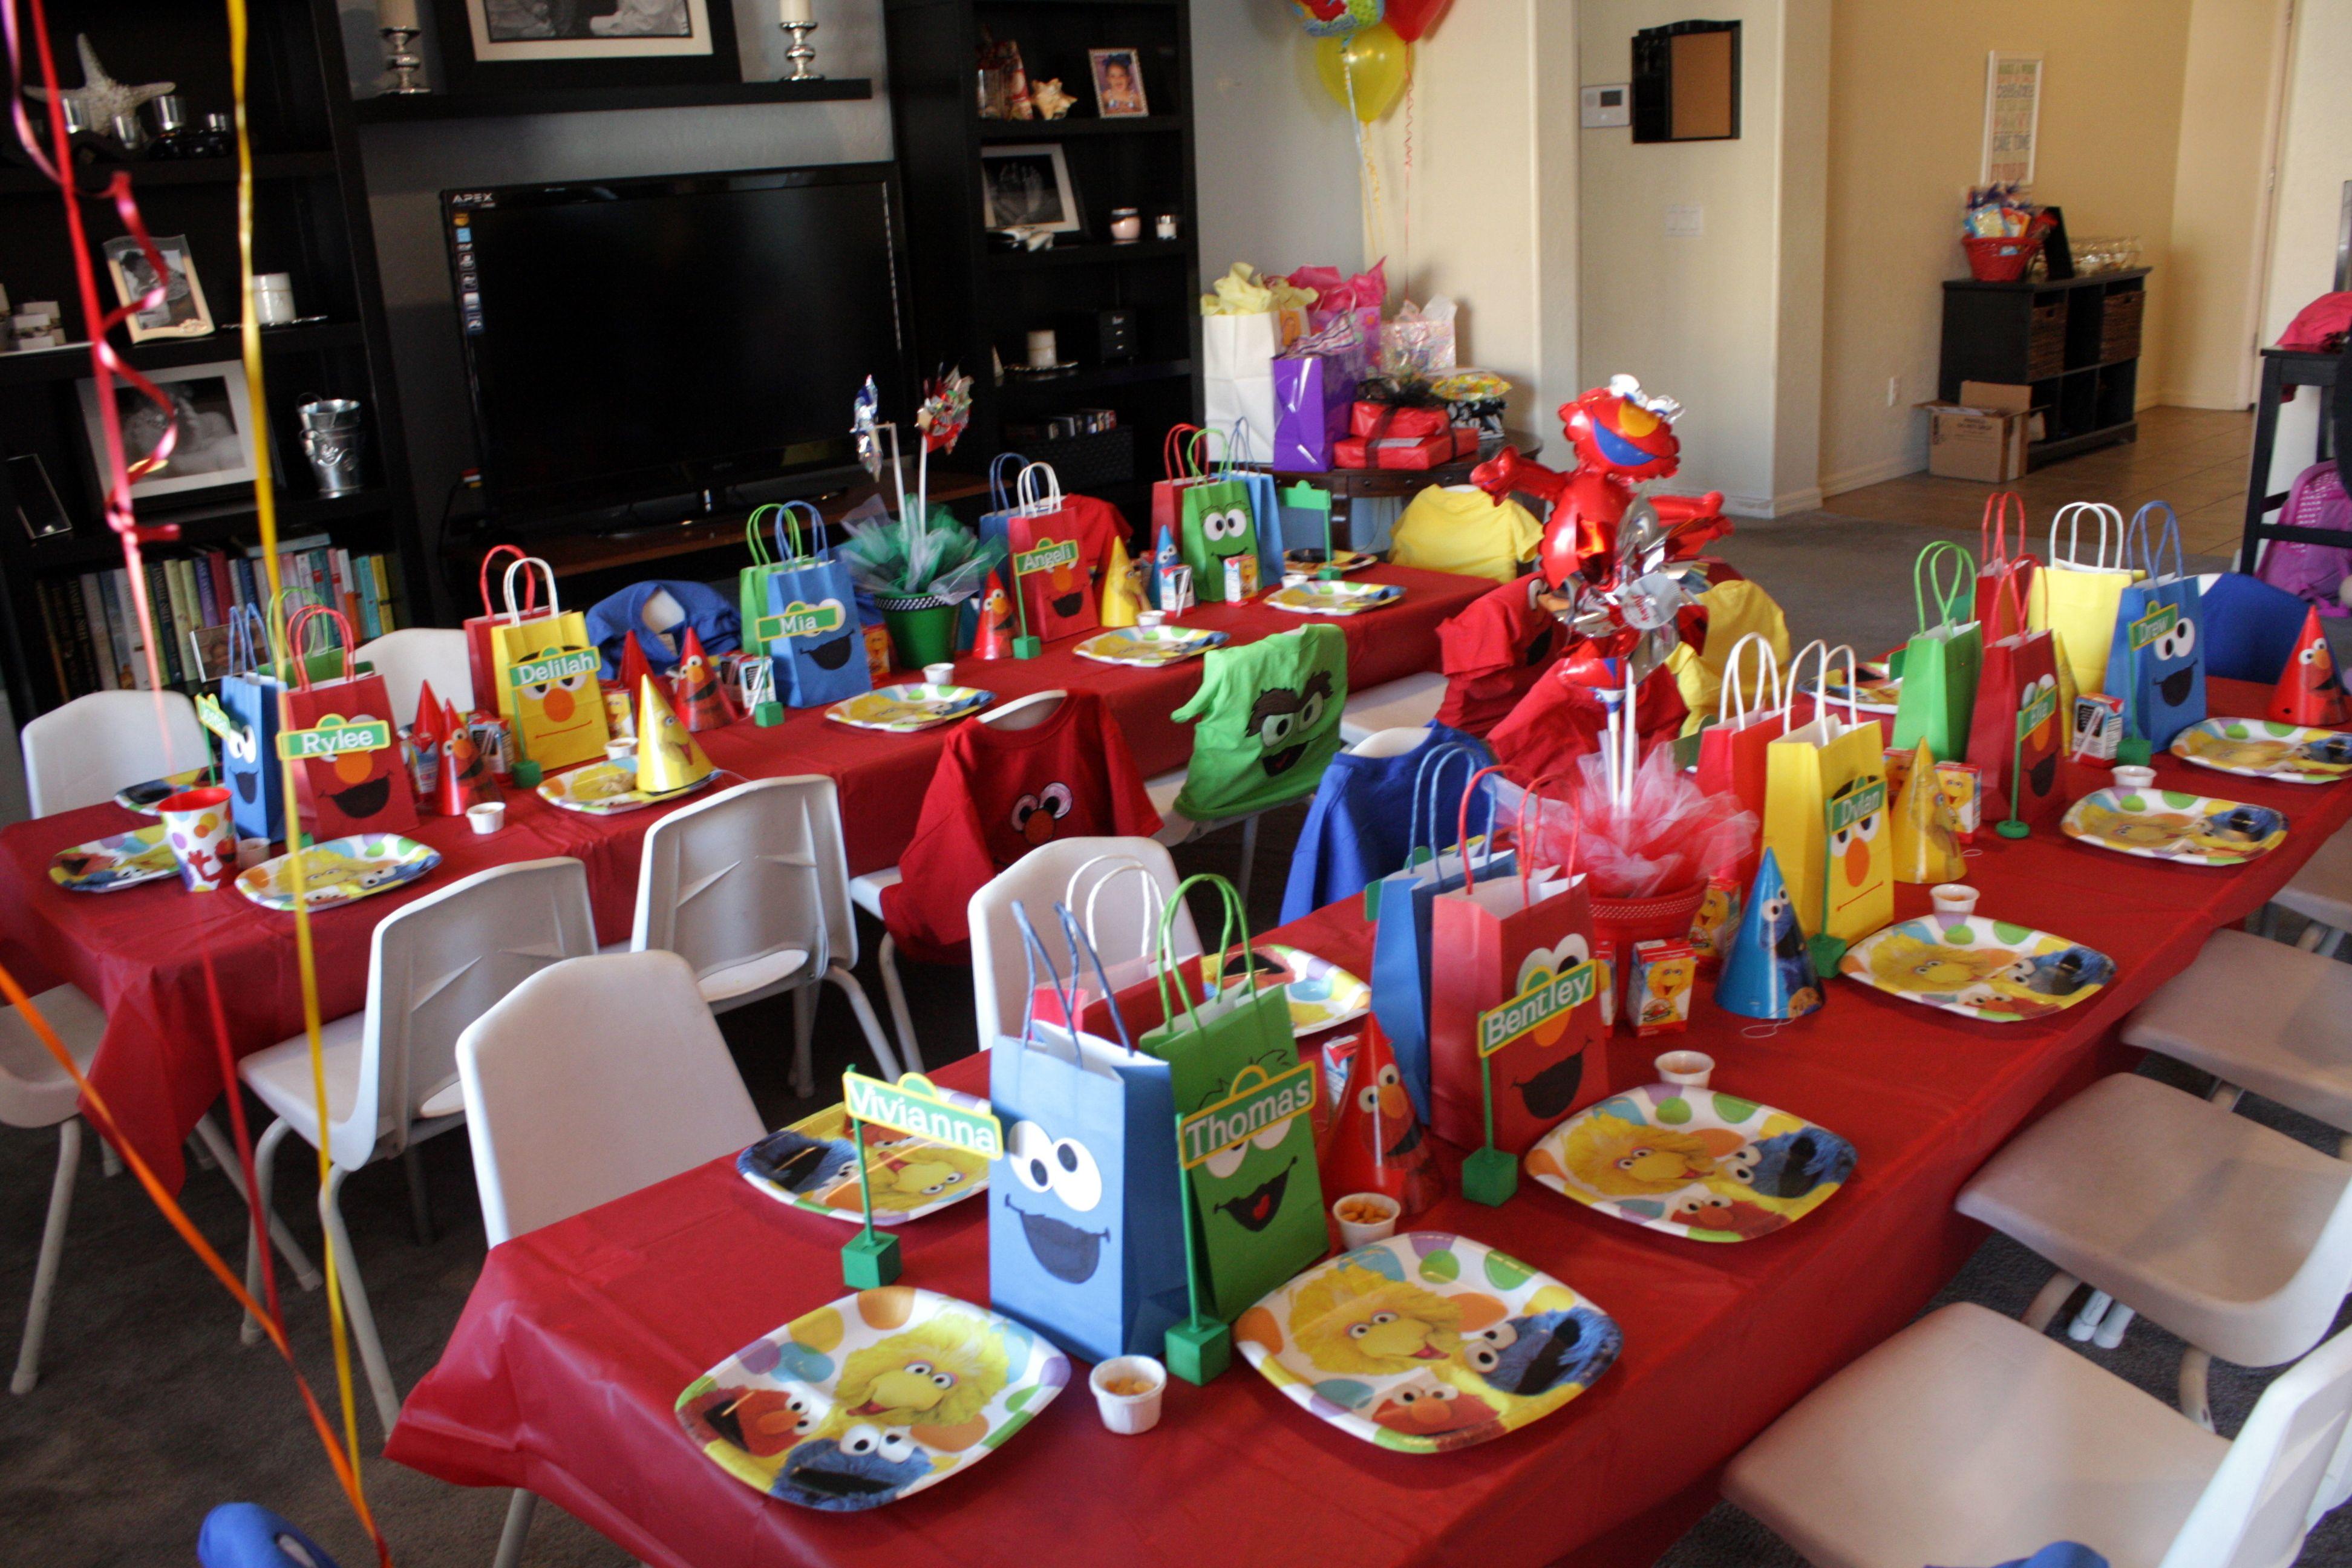 Jordan's Sesame Street party